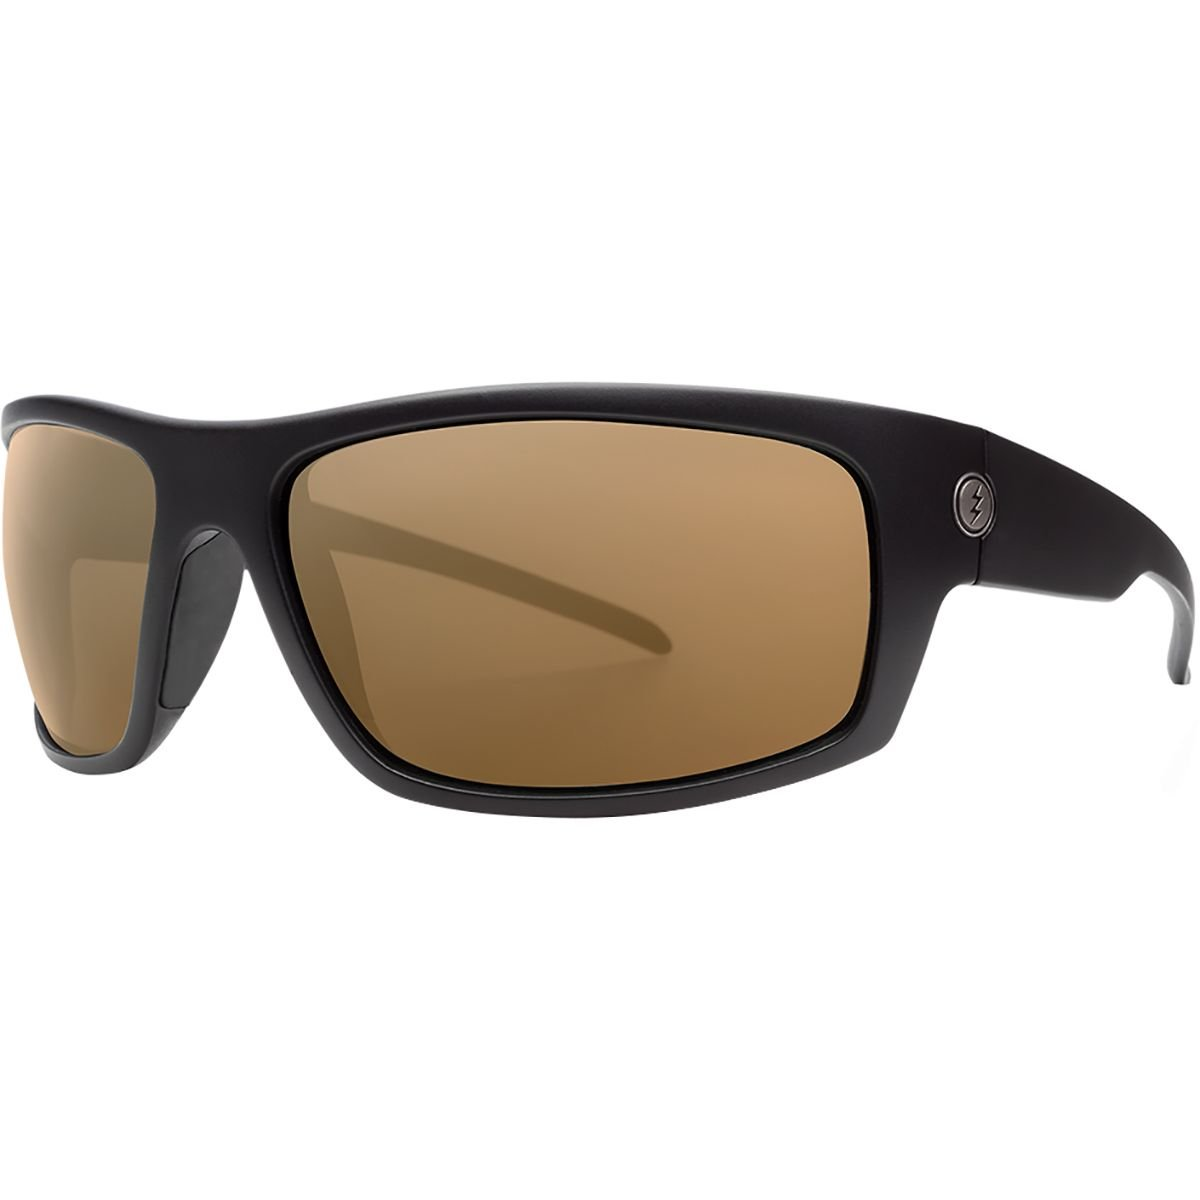 Electric Visual Tech One XLS Matte Black/OHM+Polarized Bronze Sunglasses